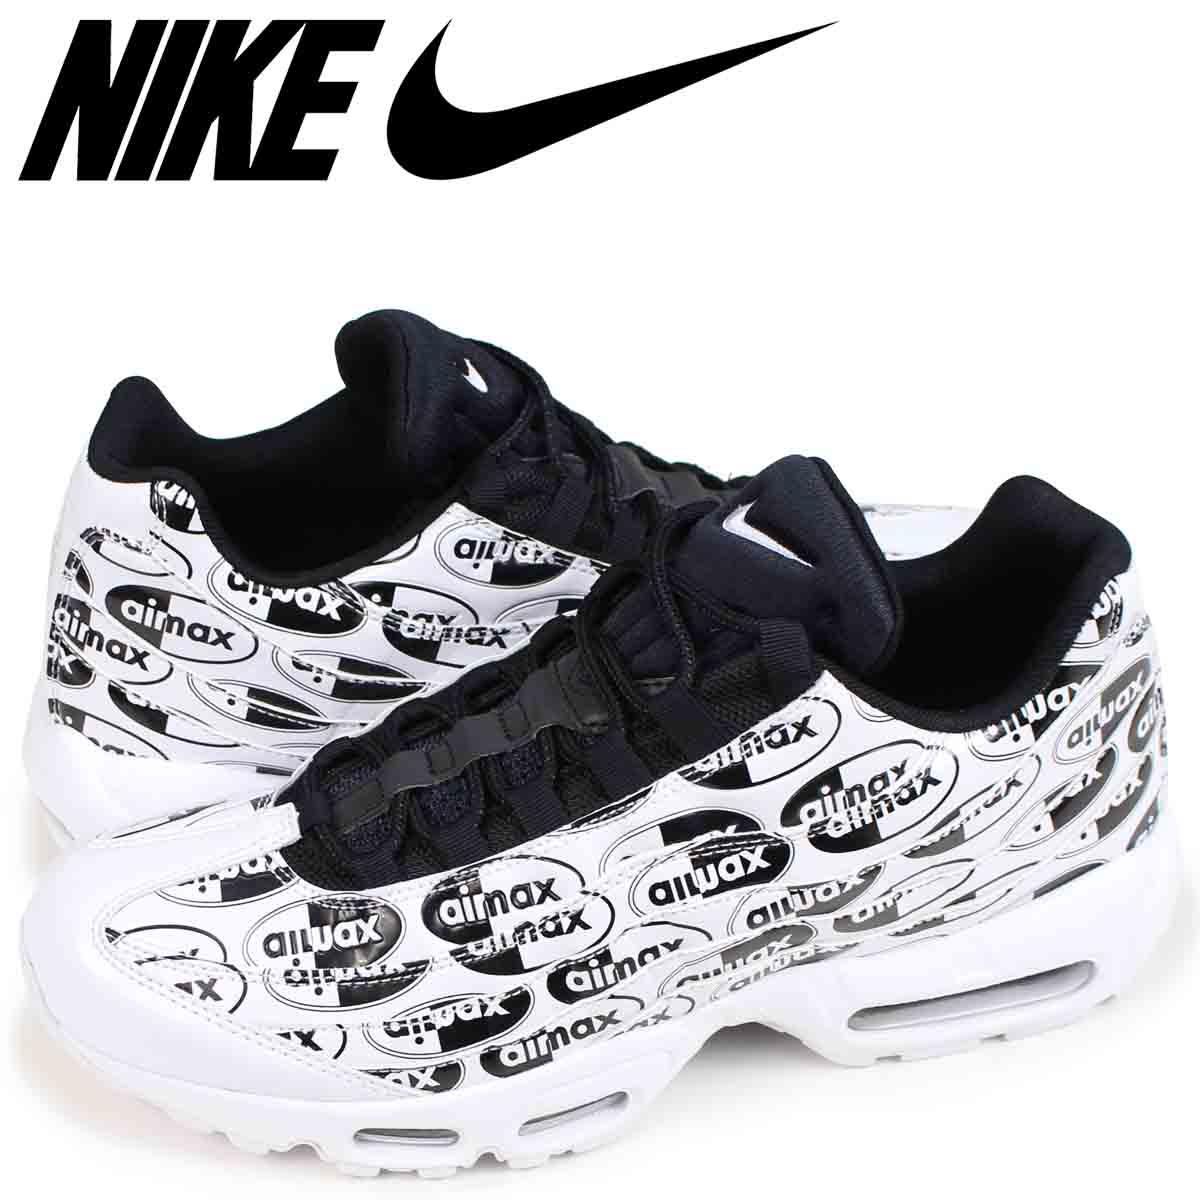 Mens Shoes Nike Air Max 95 Premium White Black 538416 103 538416 103